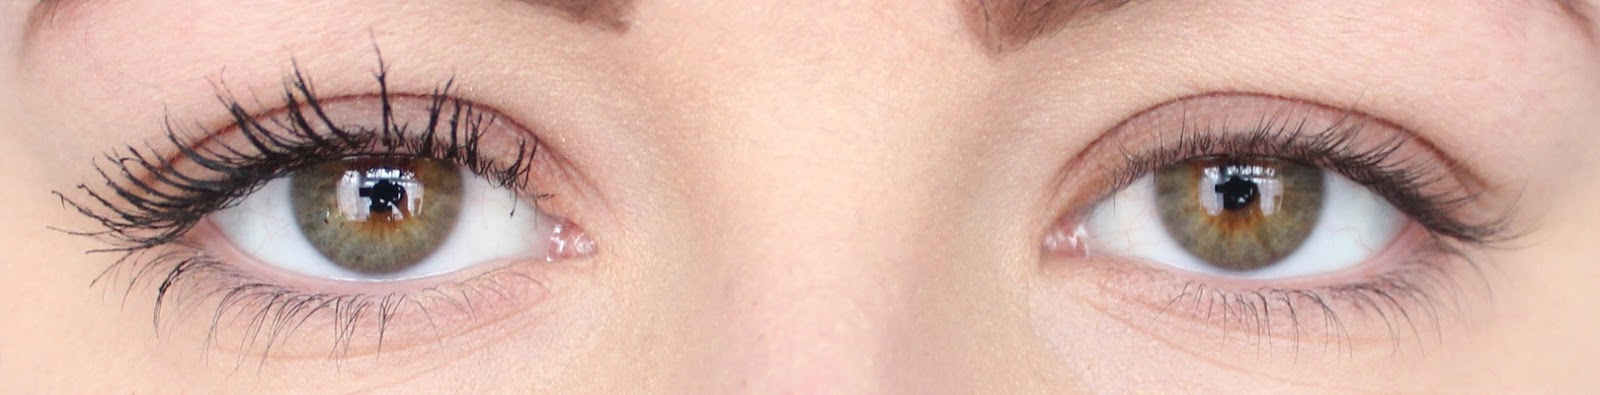 L'Oreal False Lash Superstar X Fiber Mascara